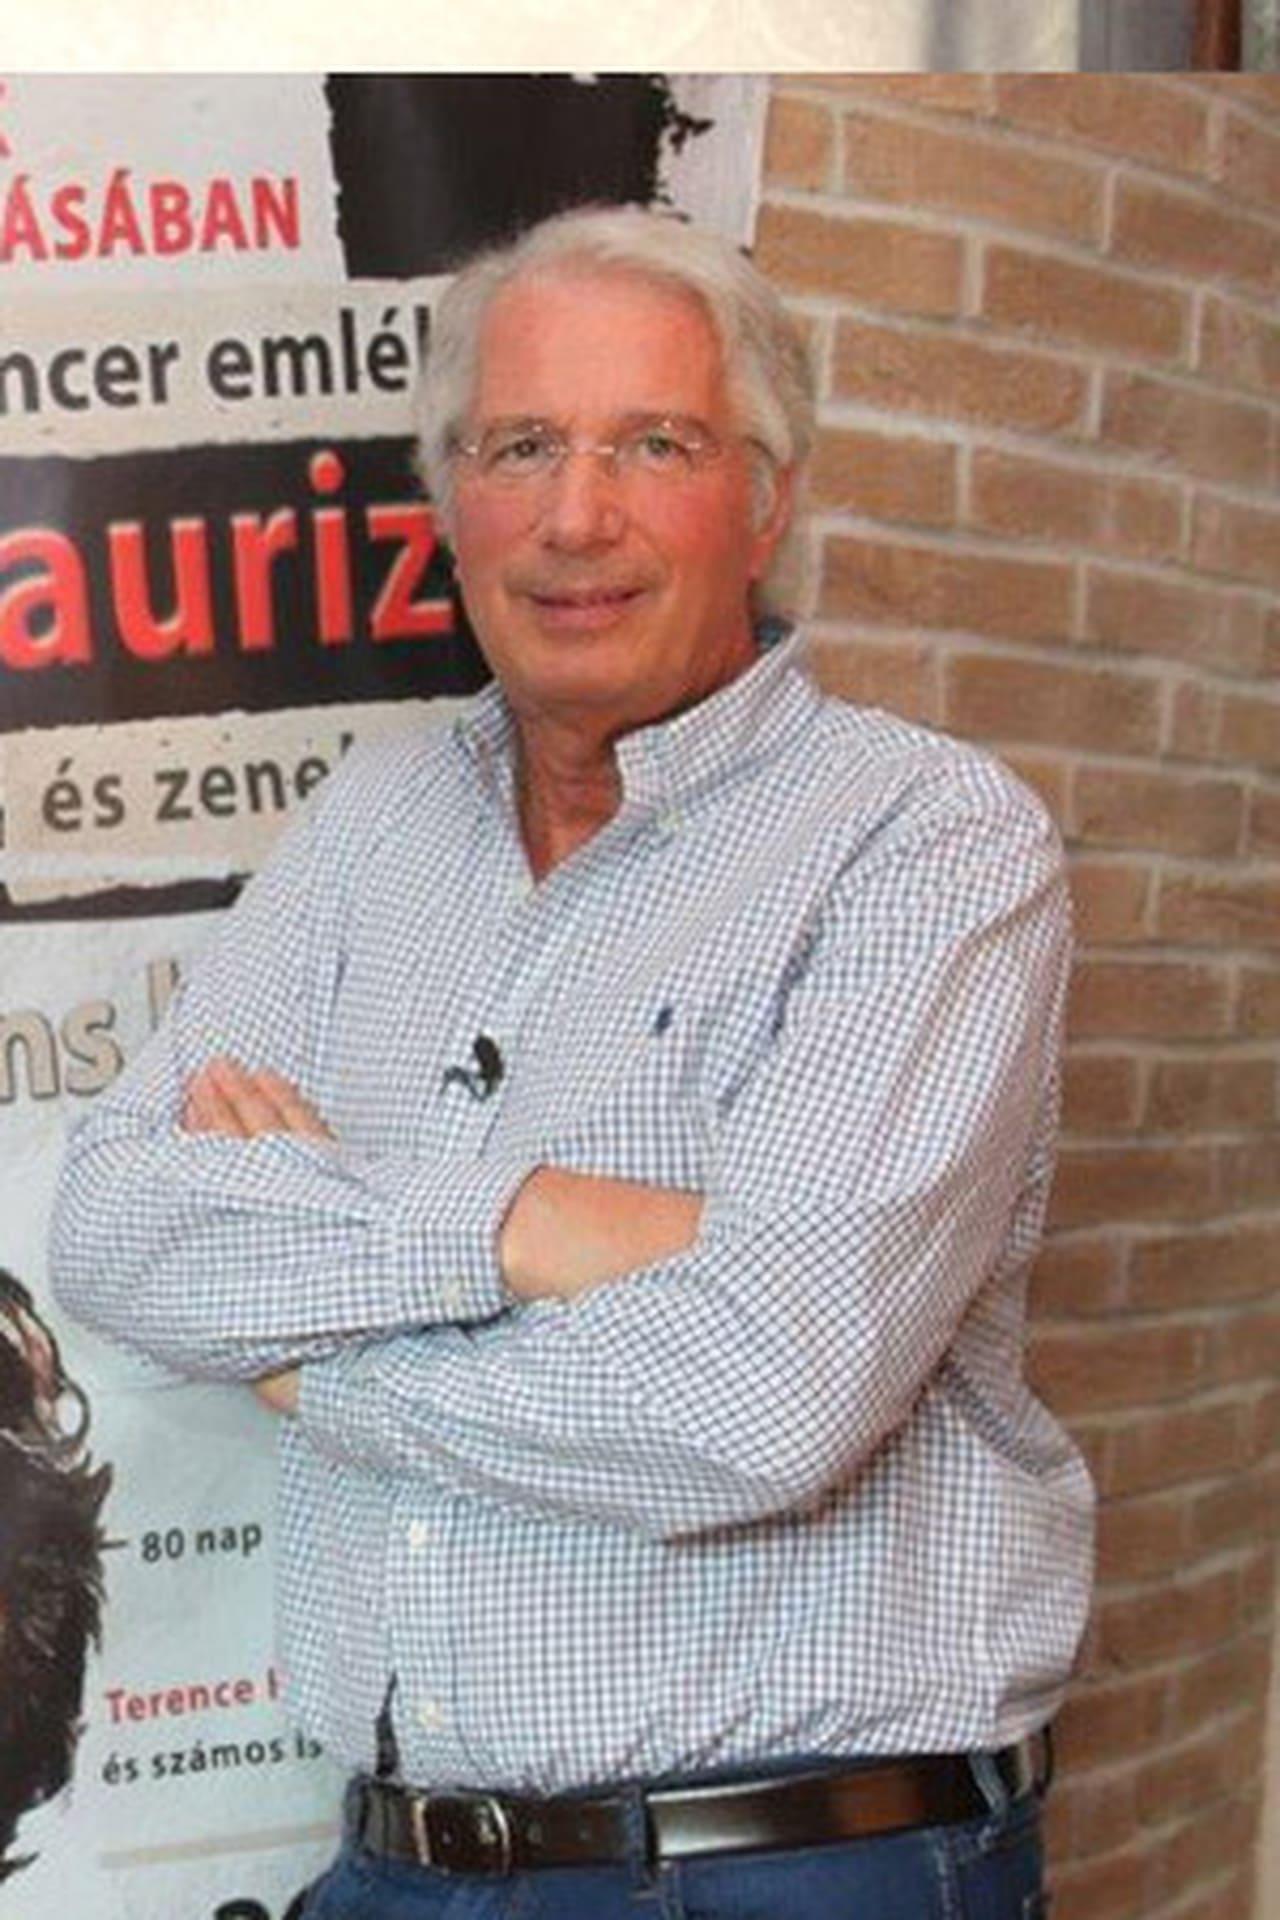 Maurizio De Angelis